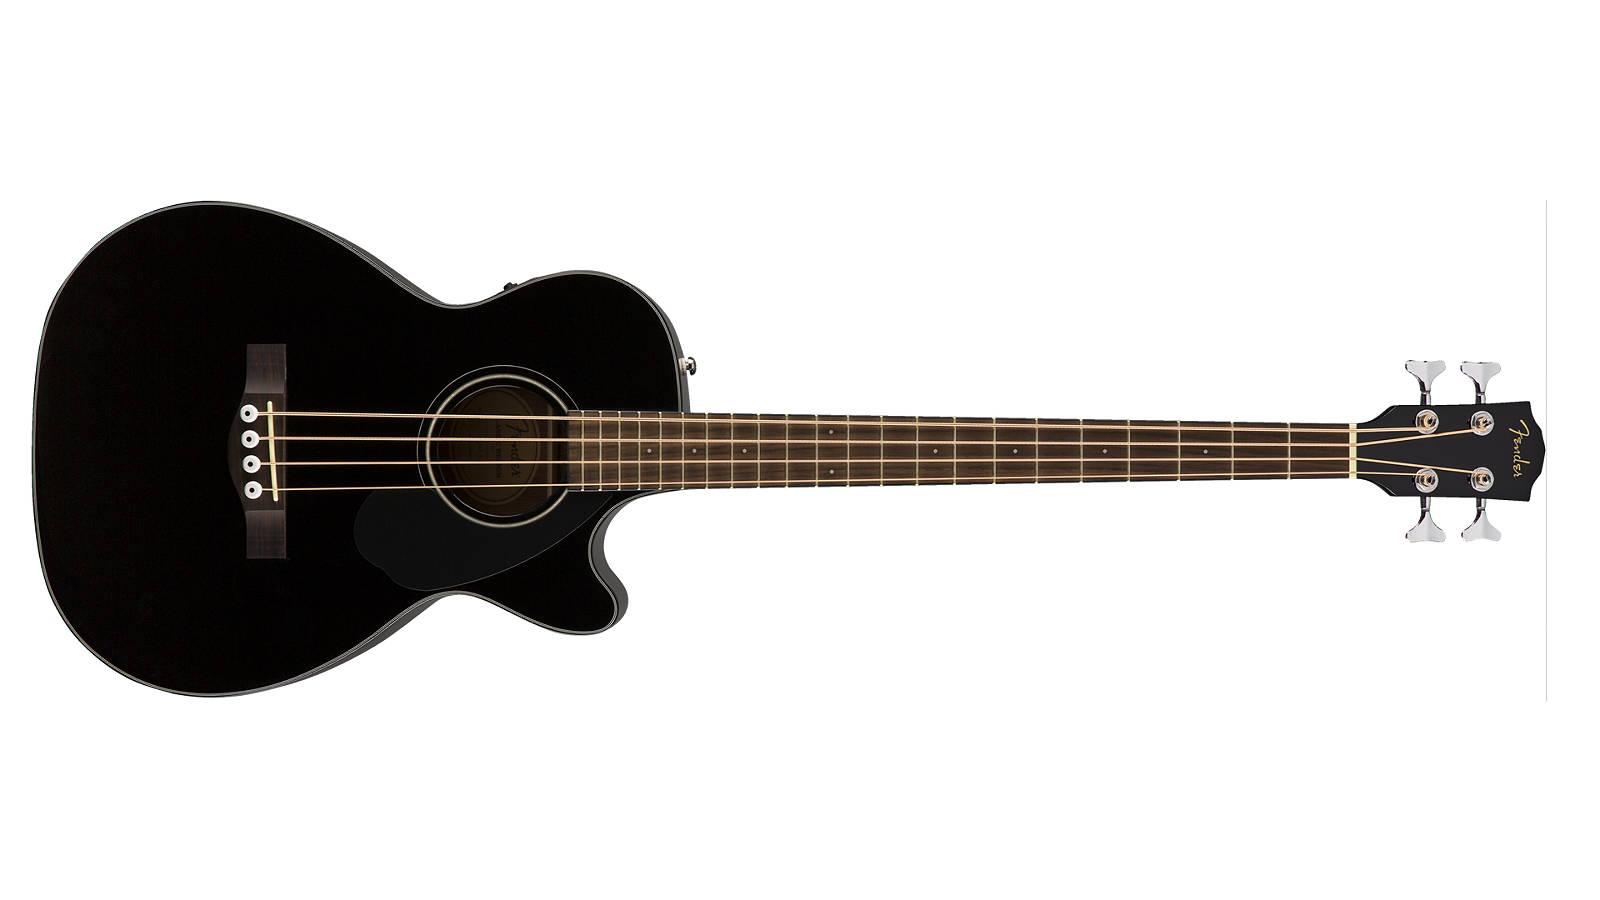 Fender CB-60SCE BLK Akustikbass